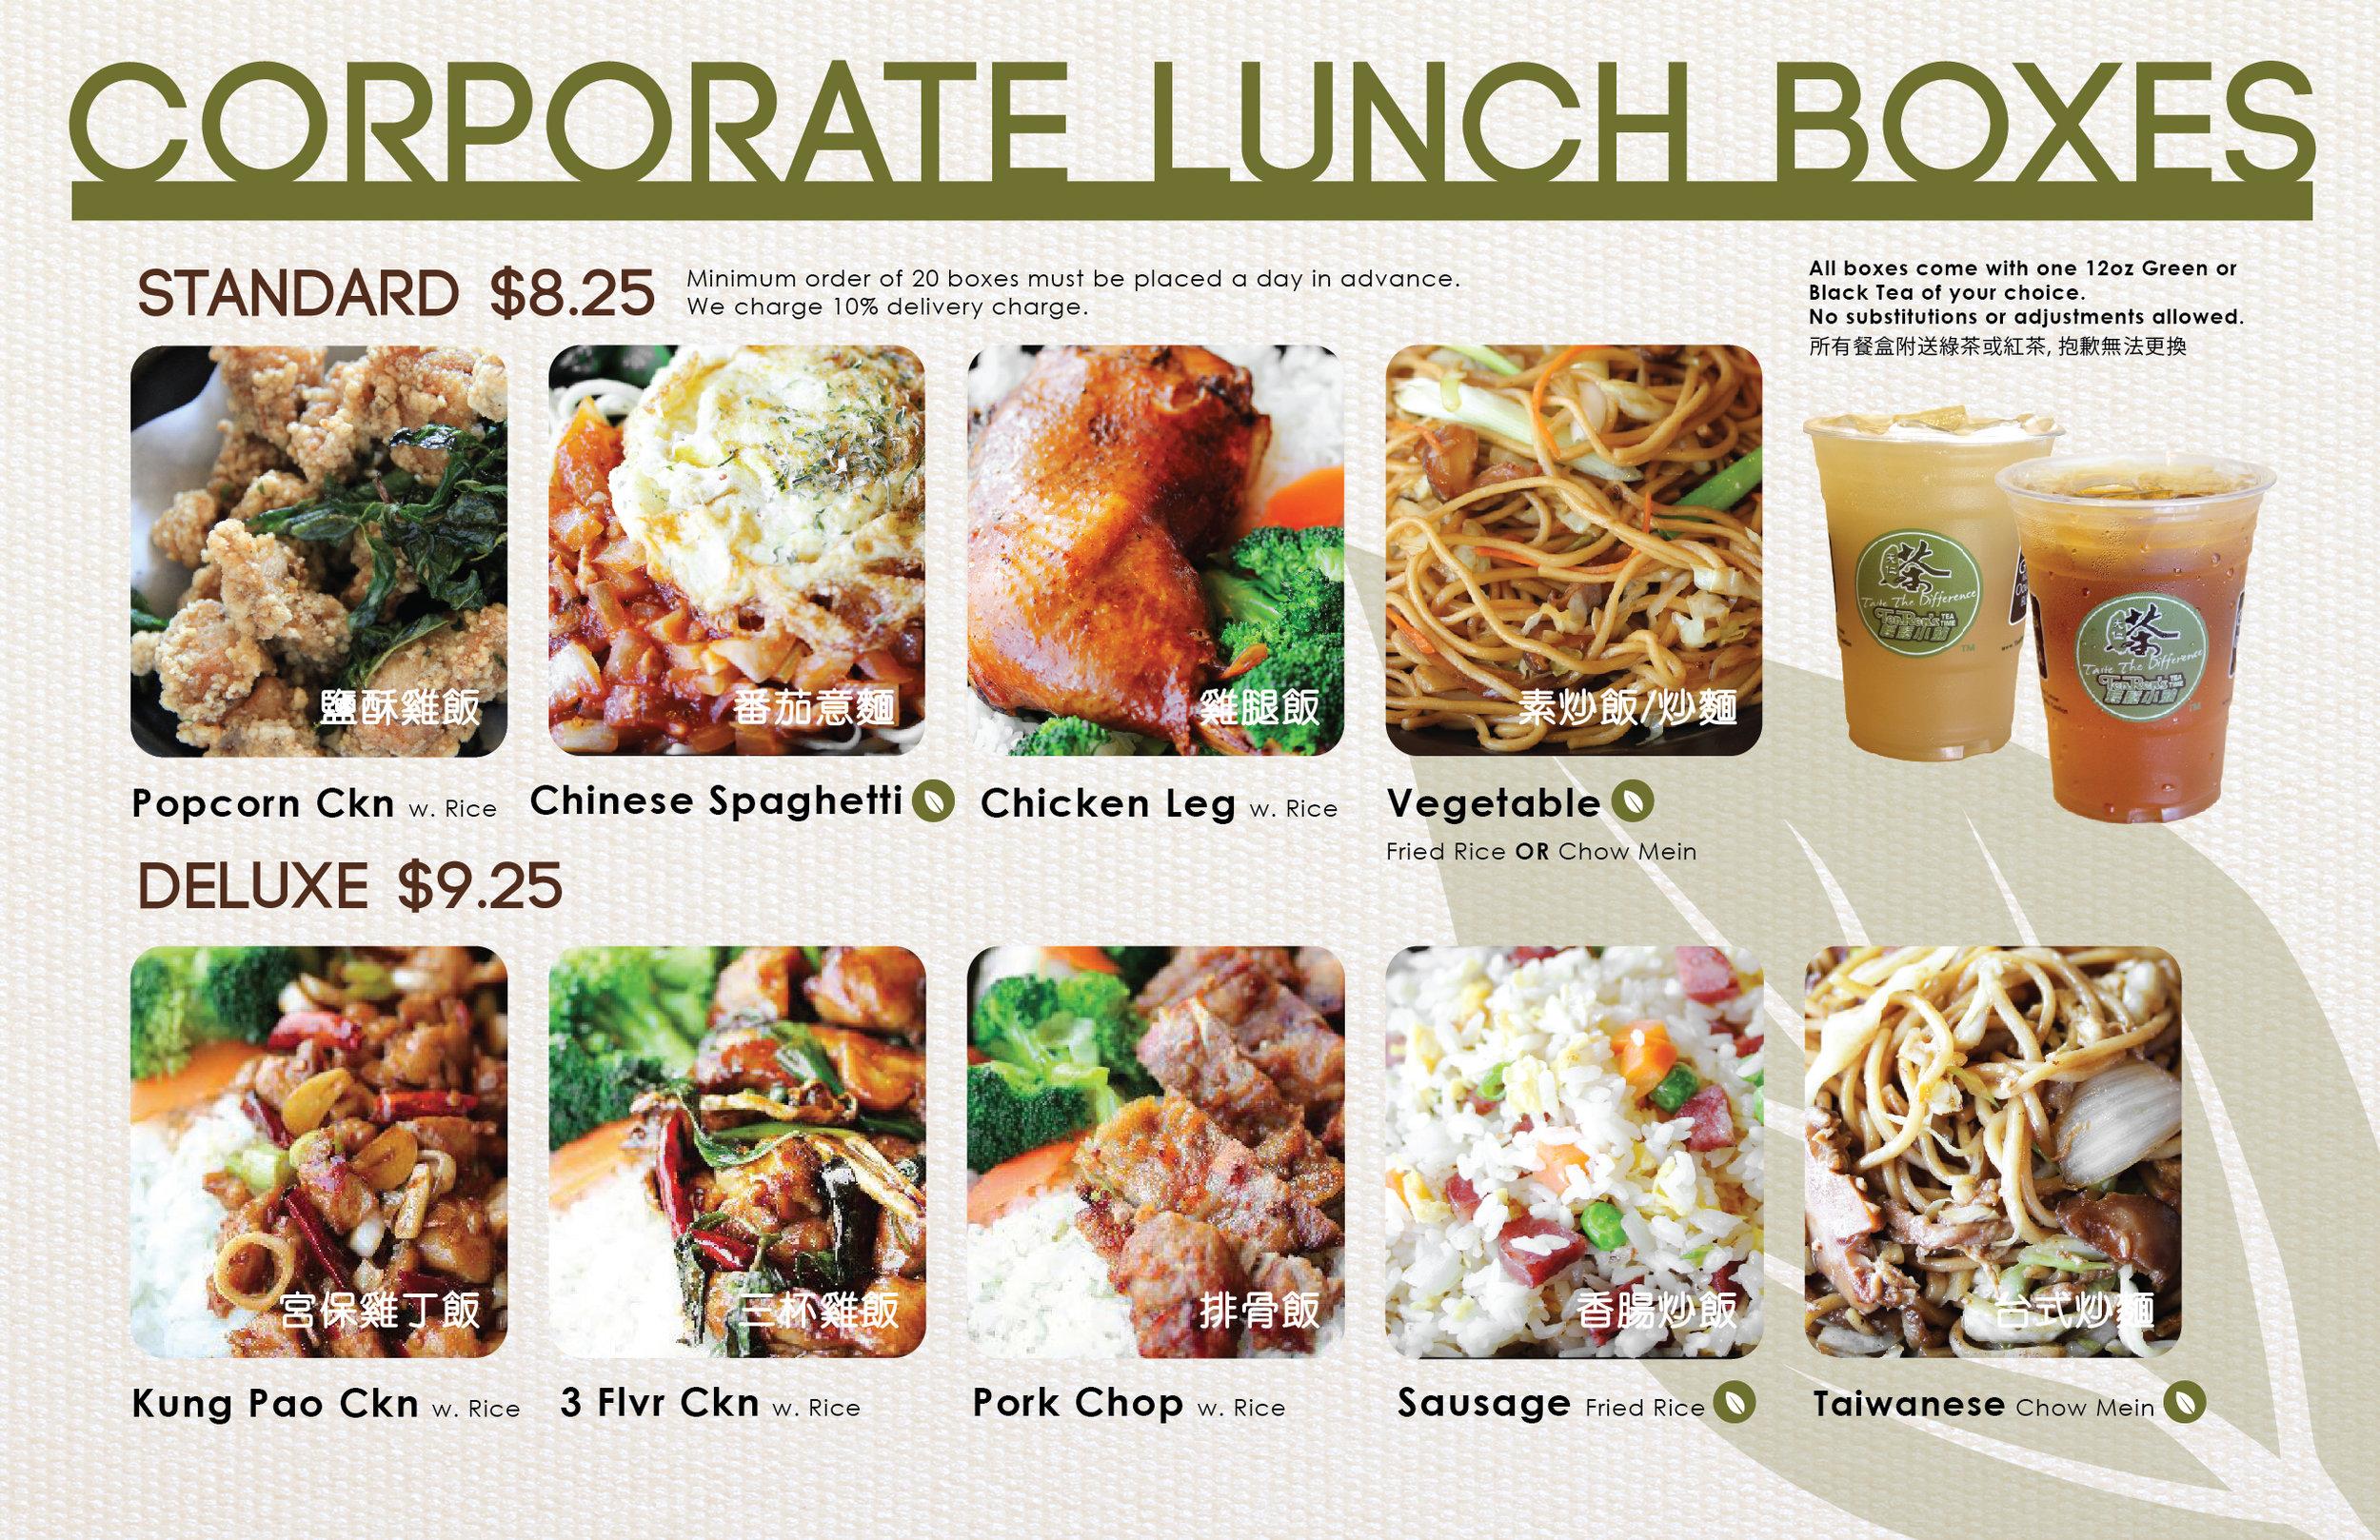 Corporate Lunch Box Info sheet